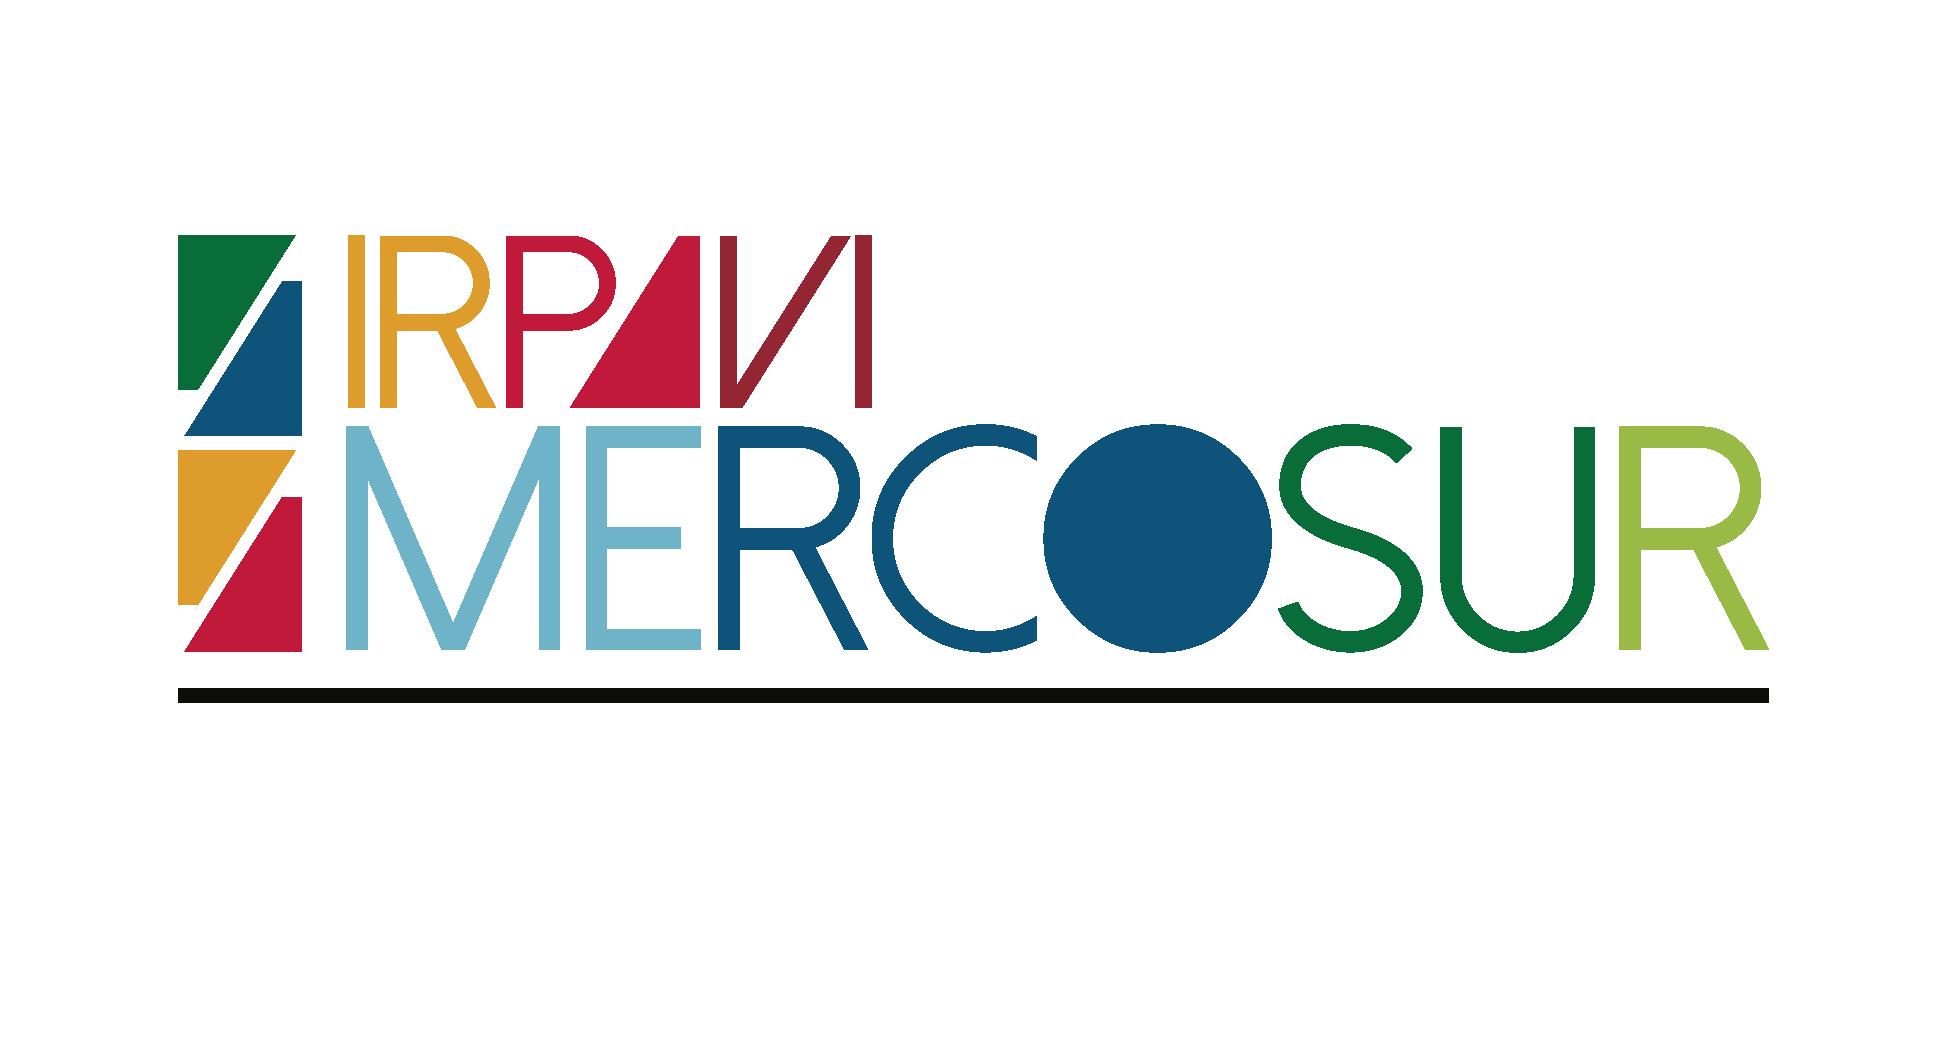 Mercosur Irpavi